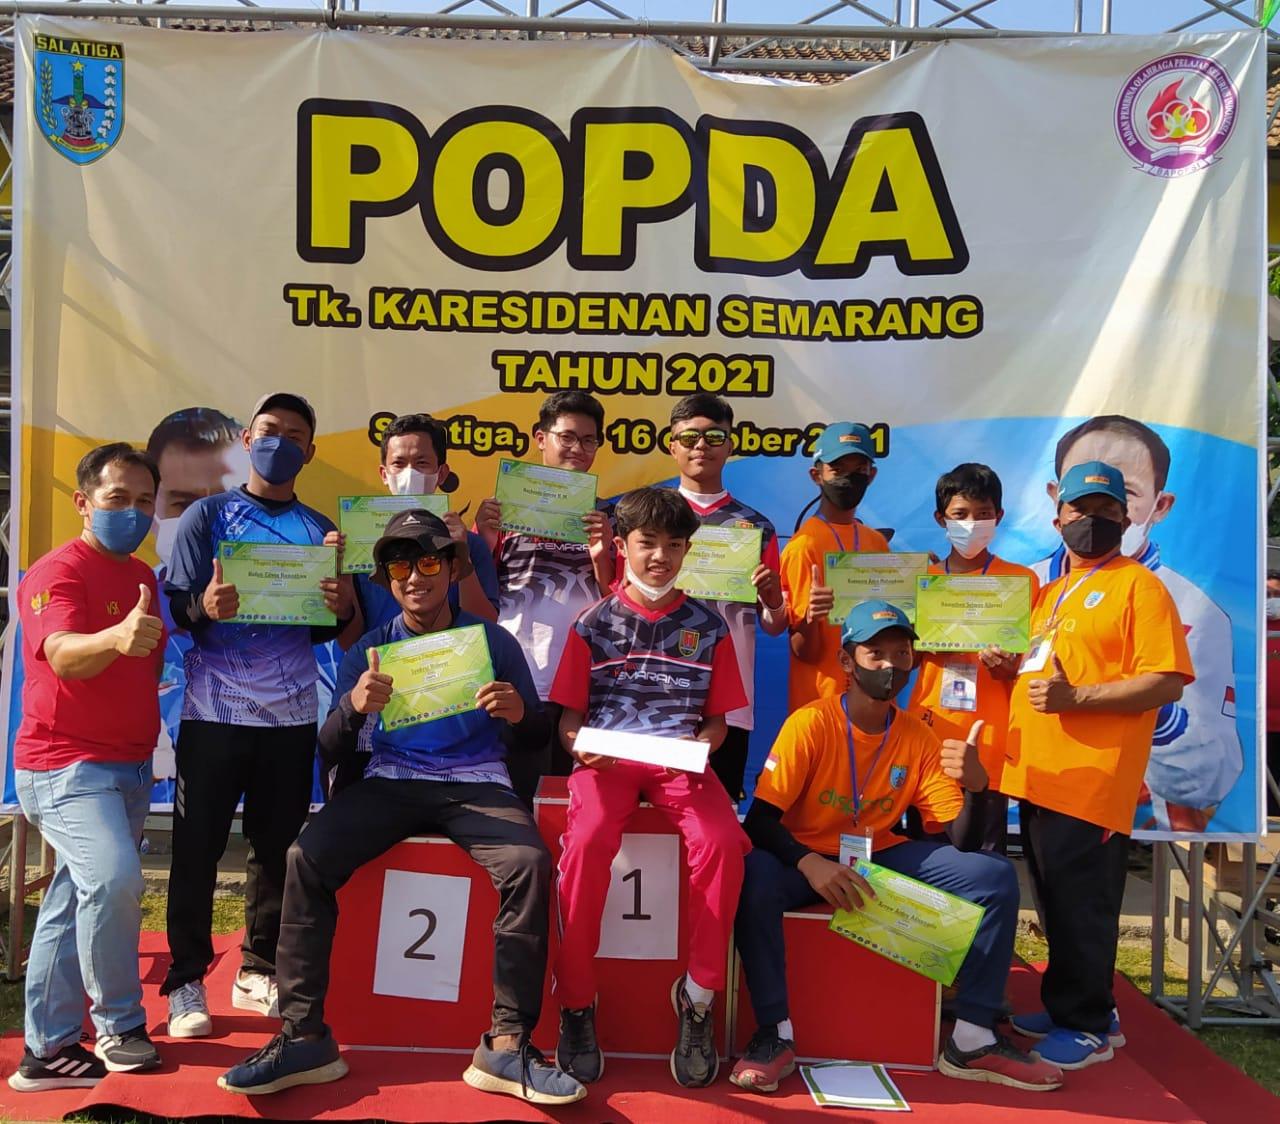 Anshara Farrel Firlana, Kuananta Astra Mahendrata dan Steven Christian Setiyanto: Menjadi Juara dalam POPDA Panahan Tingkat Karesidenan Semarang